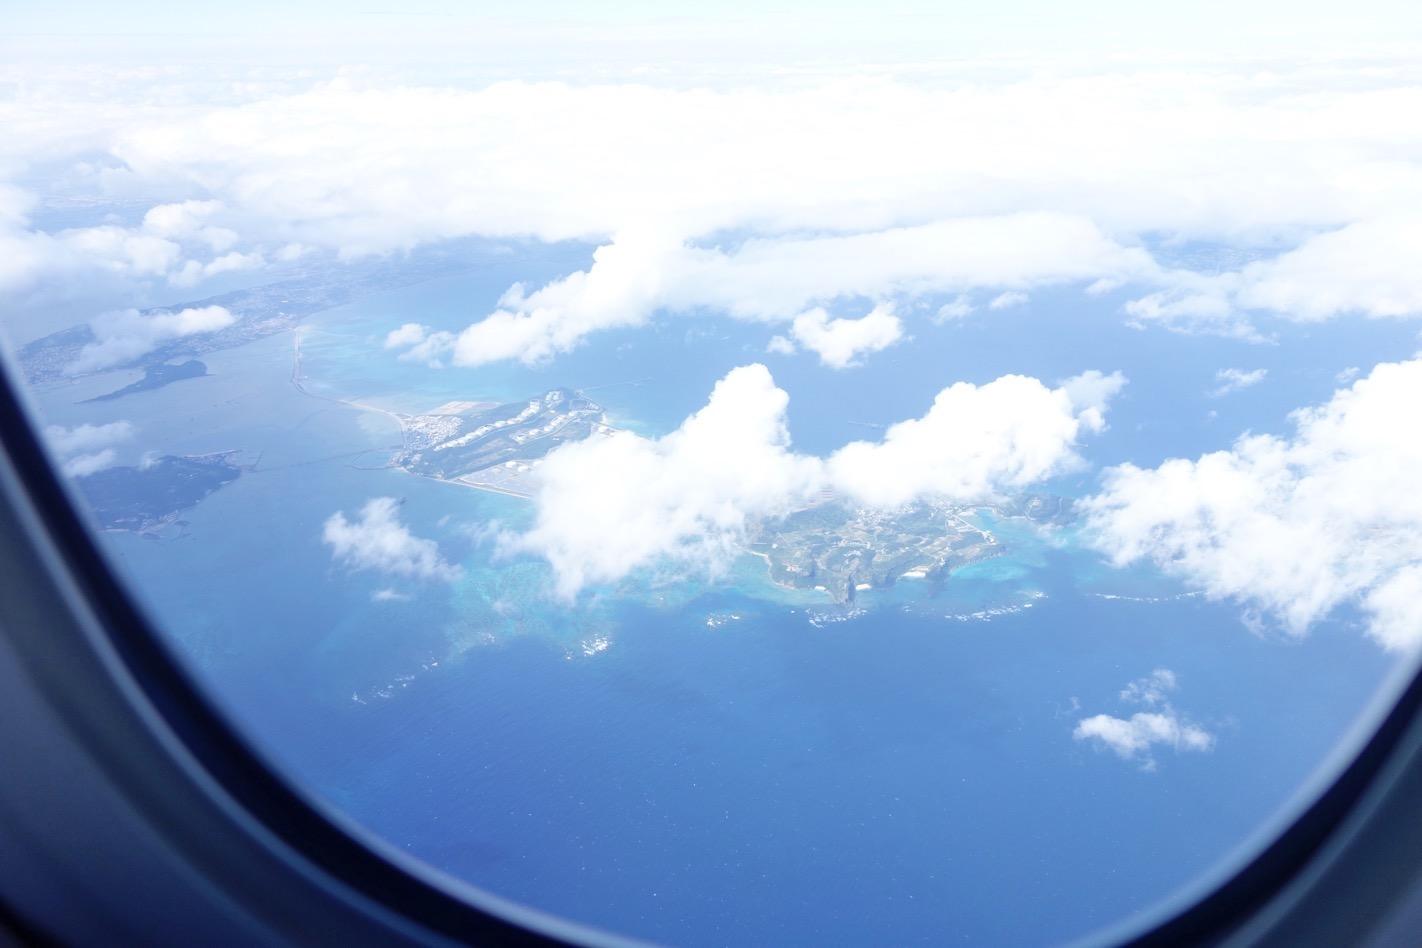 JALフライトのイメージ